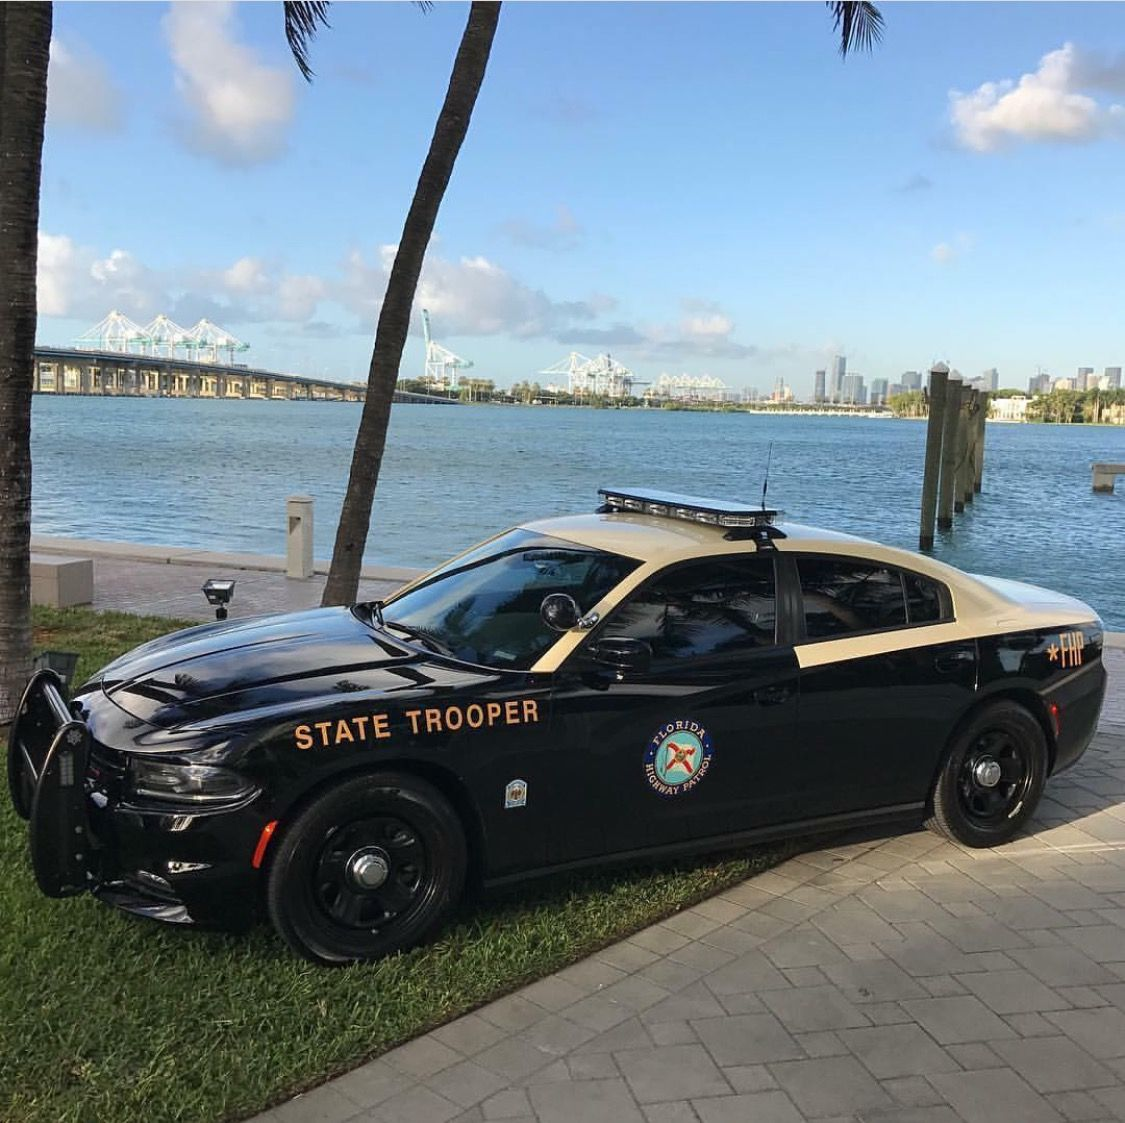 Florida Highway Patrol State Trooper Dodge Charger Police Cars Police Truck Police Patrol